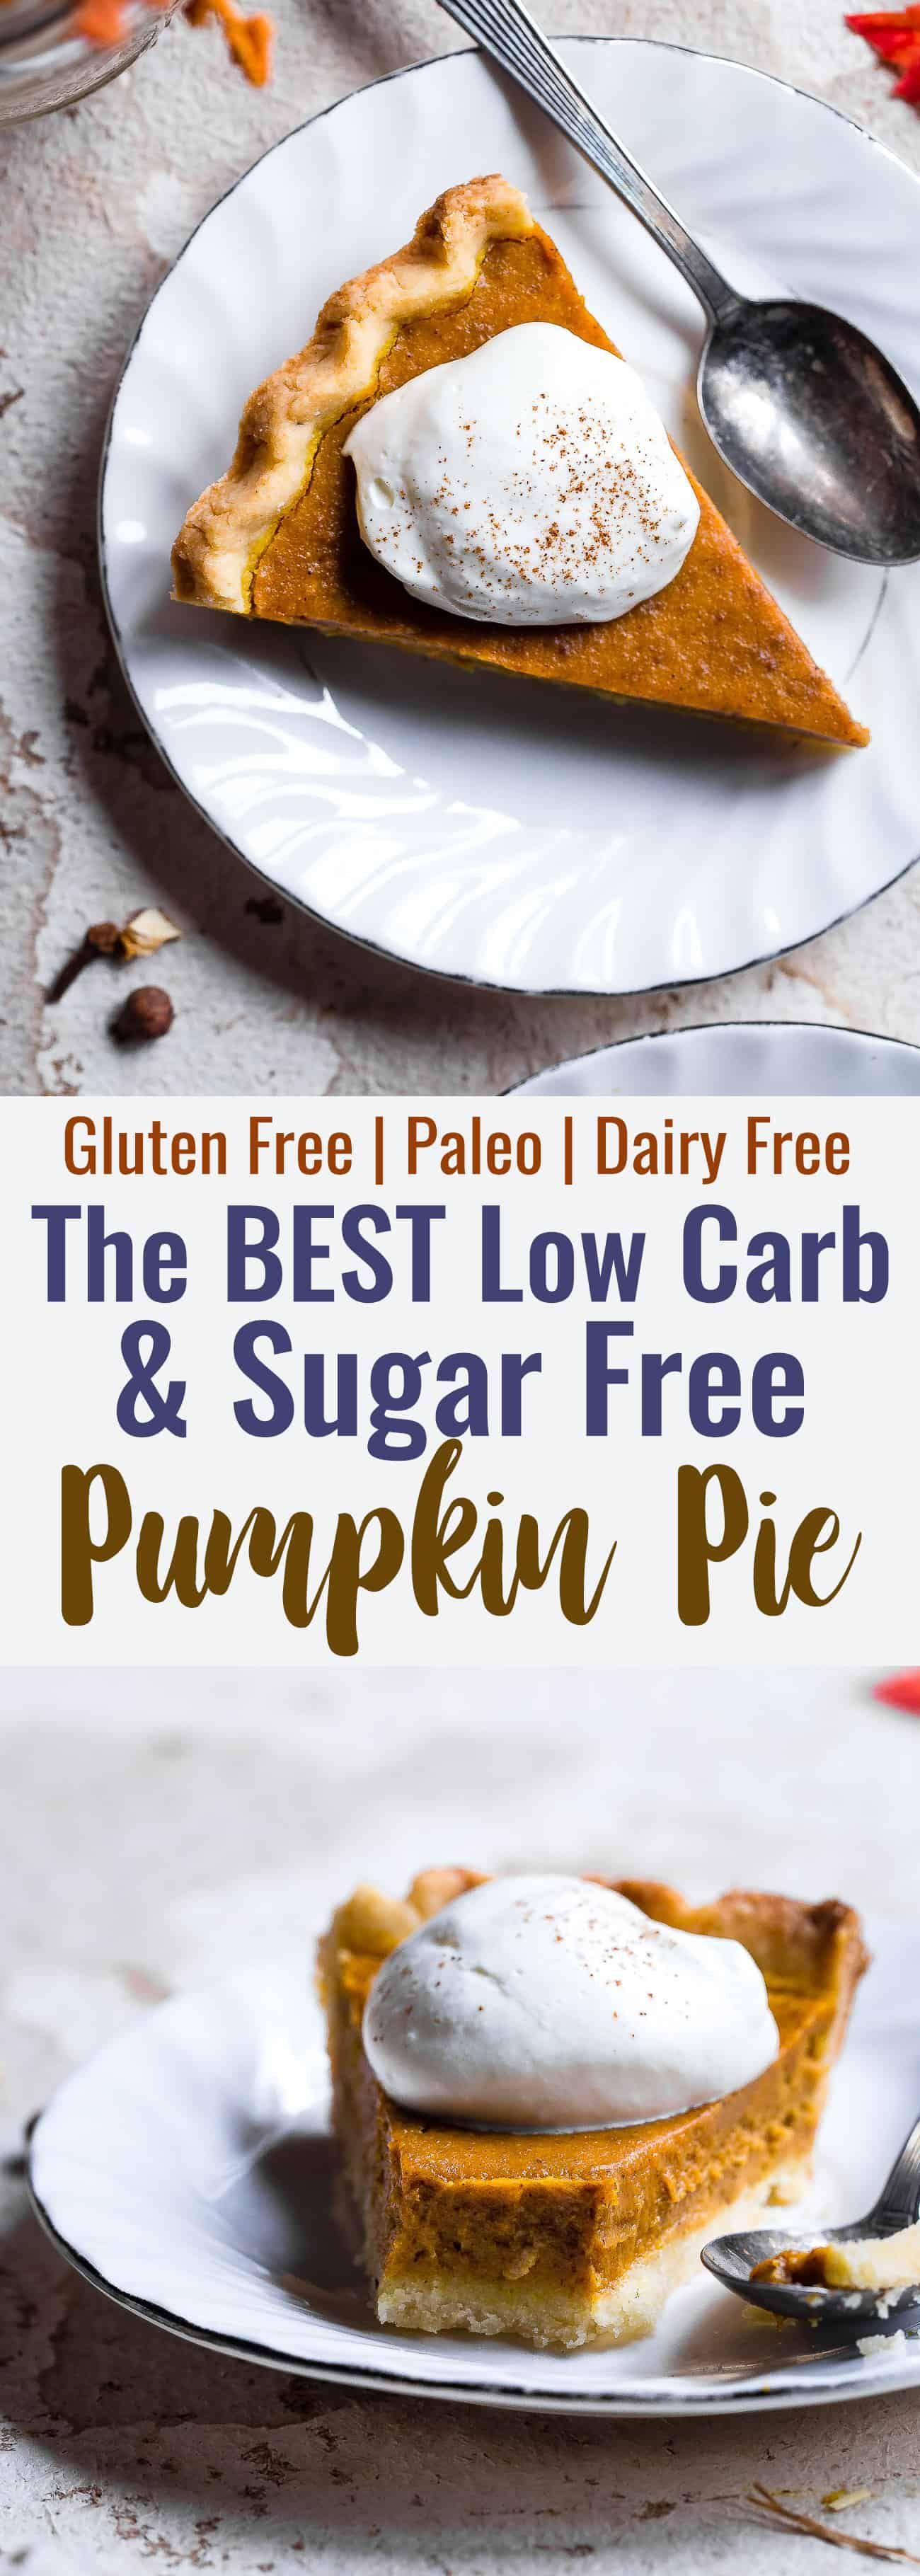 Paleo Low Carb Sugar Free Pumpkin Pie | Food Faith Fitness